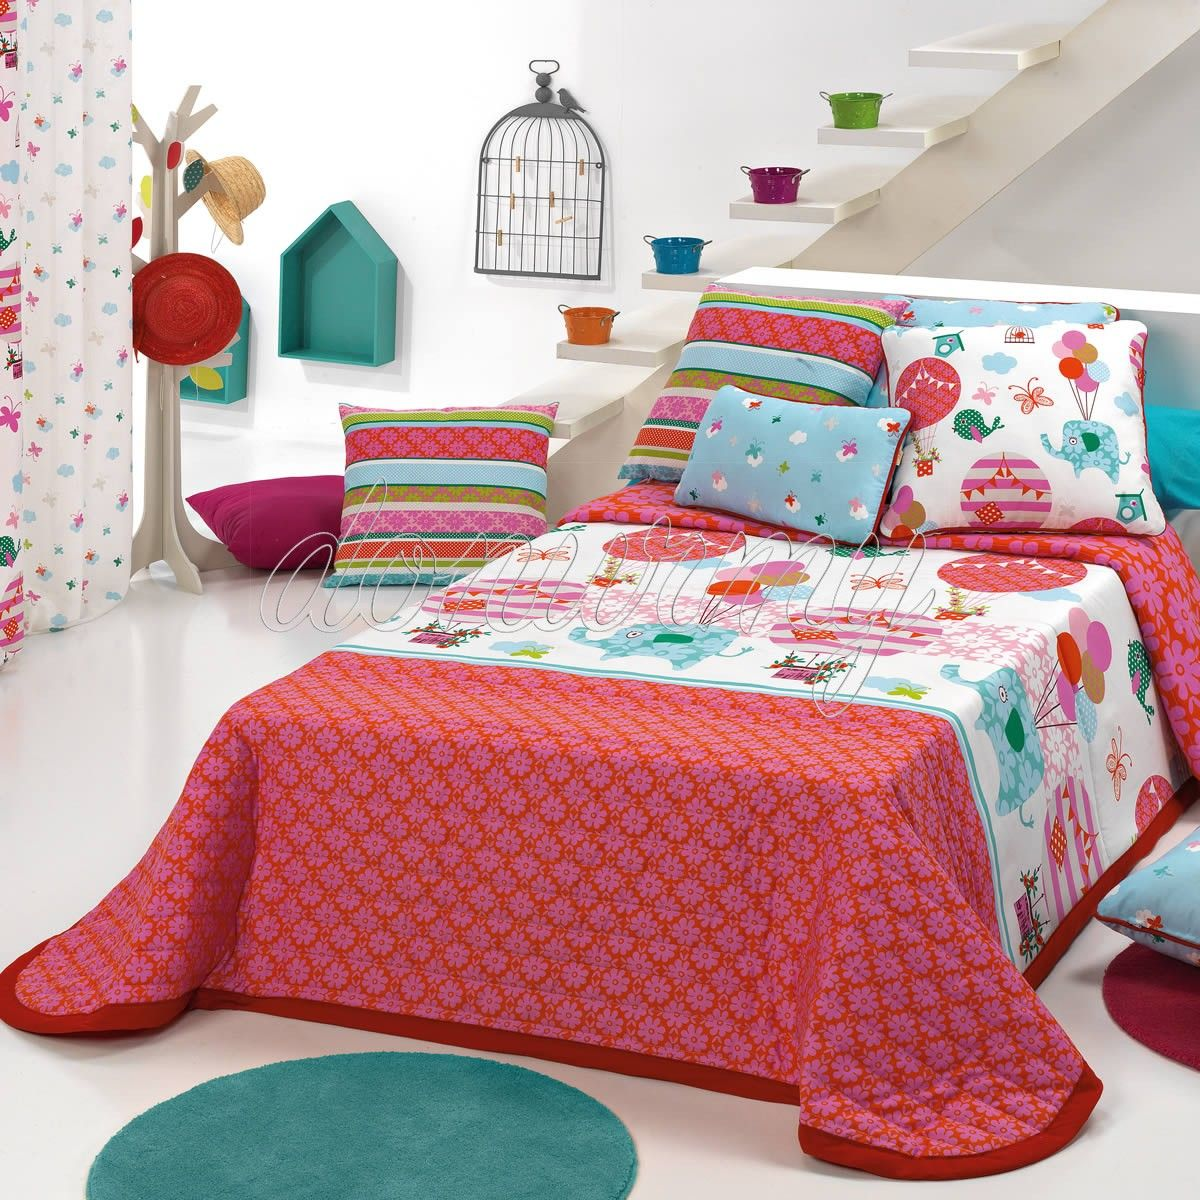 Colcha Bouti Globe Cañete | Colchas bouti, Ropa de cama y Camas